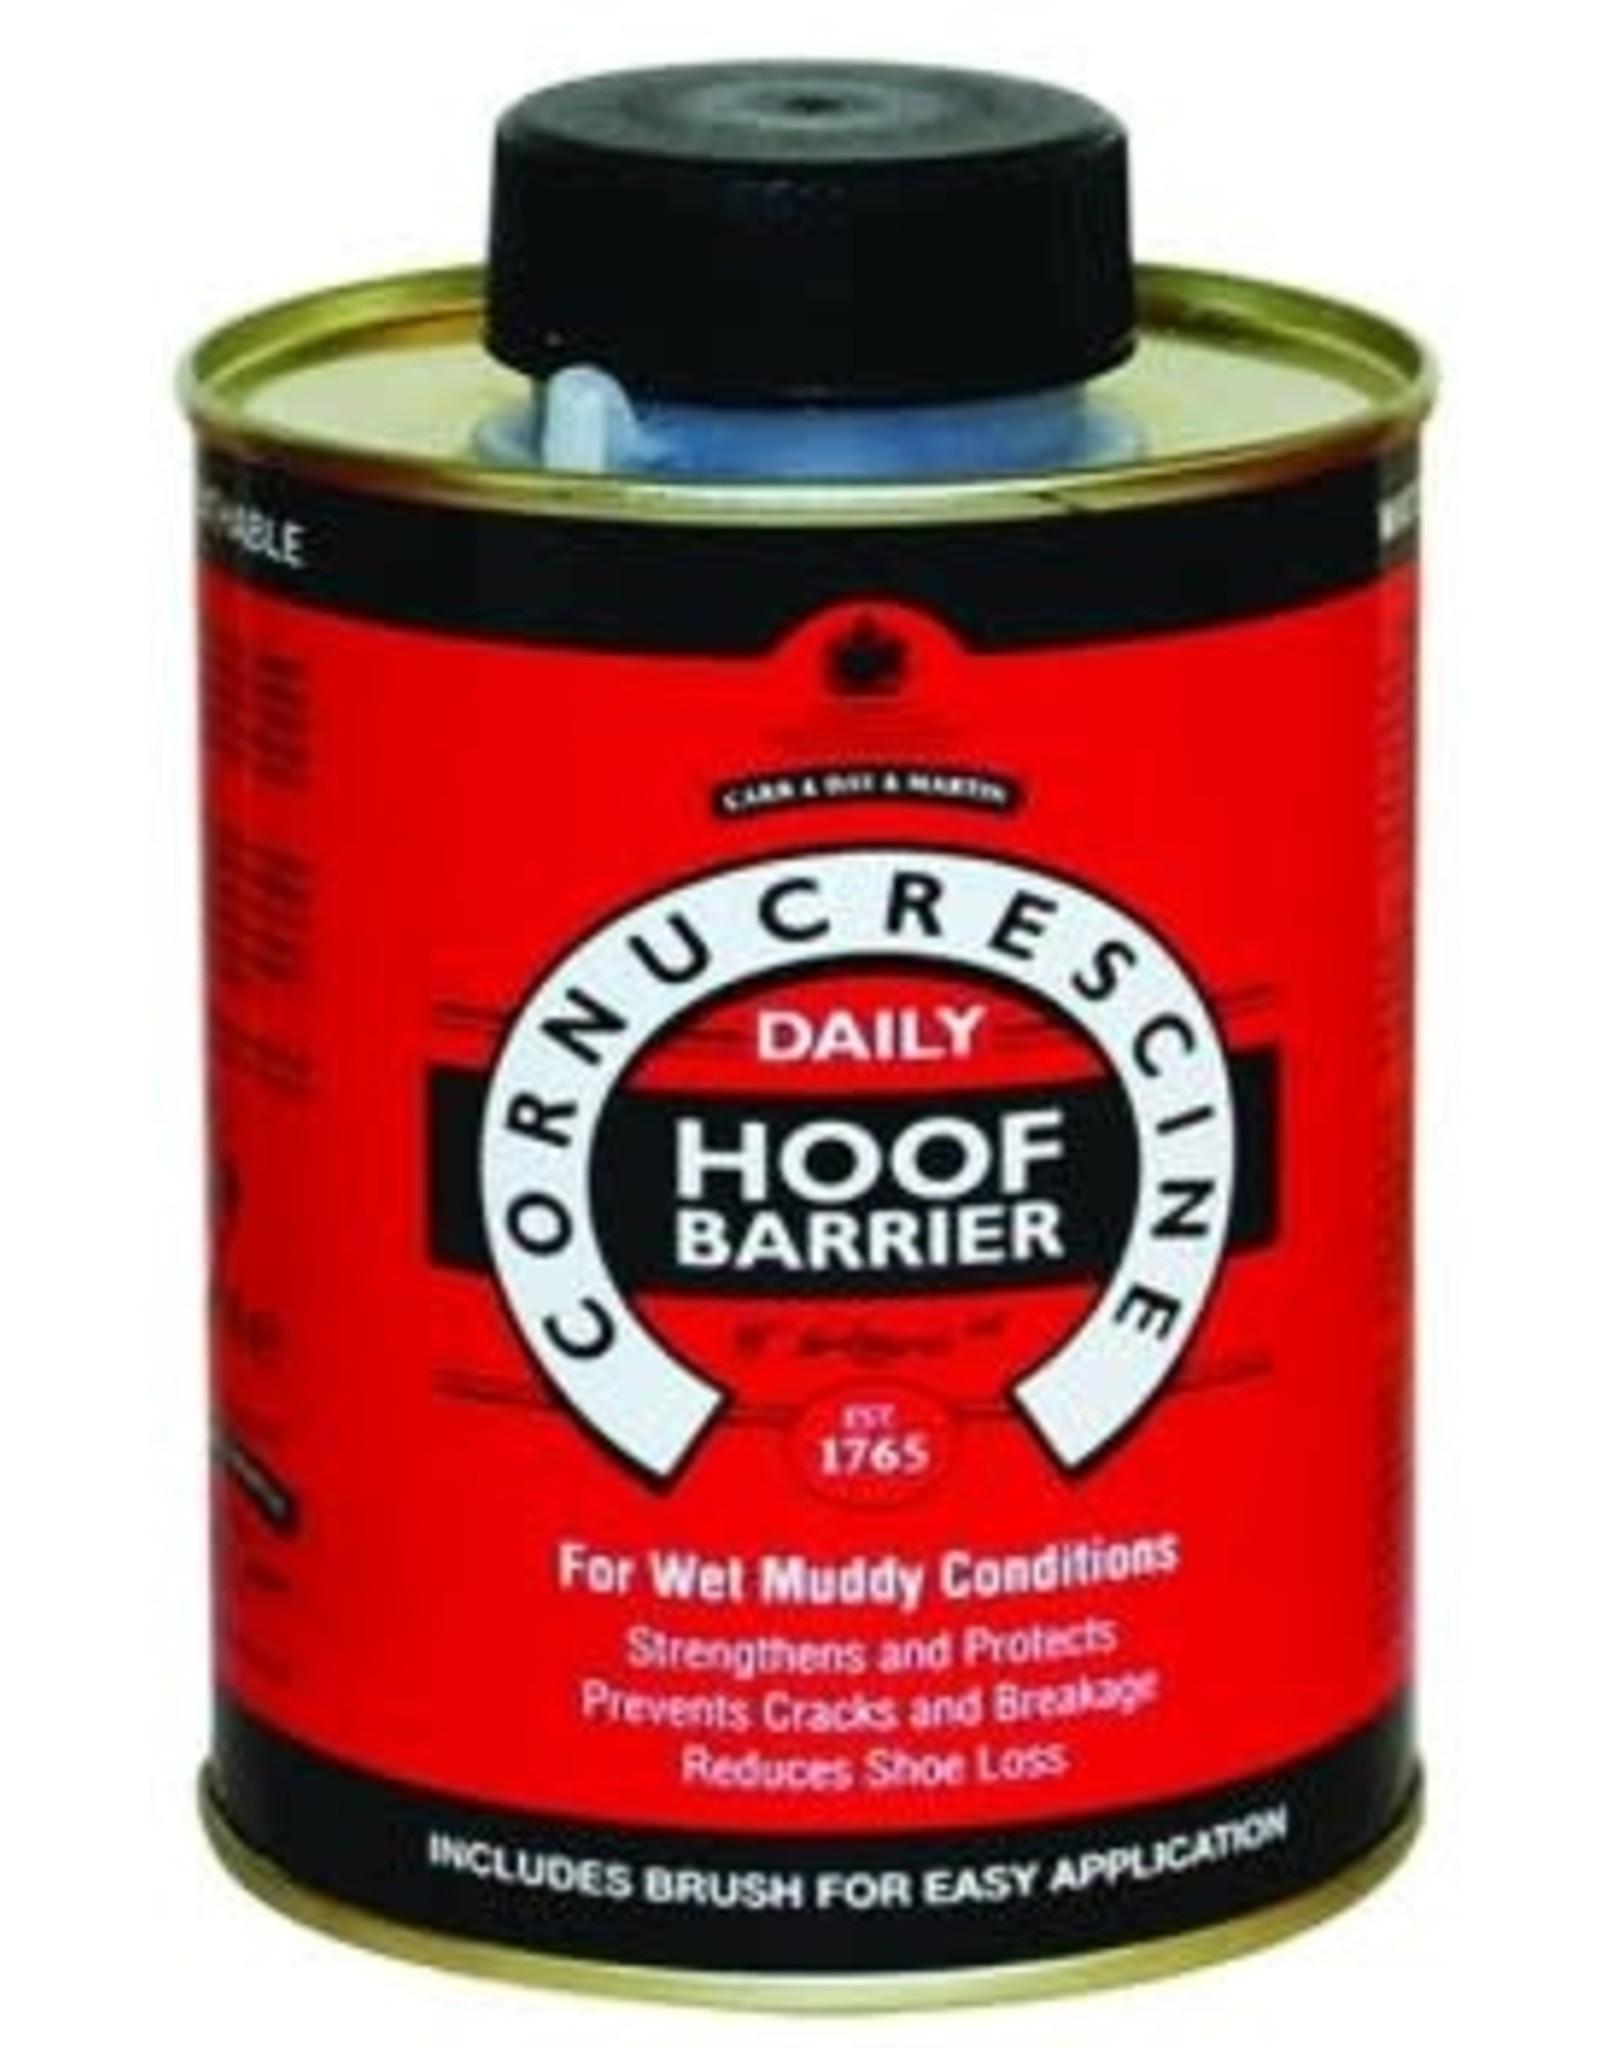 HAWTHORNE PRODUCTS INC Corrnucrescine Daily Hoof Barrier